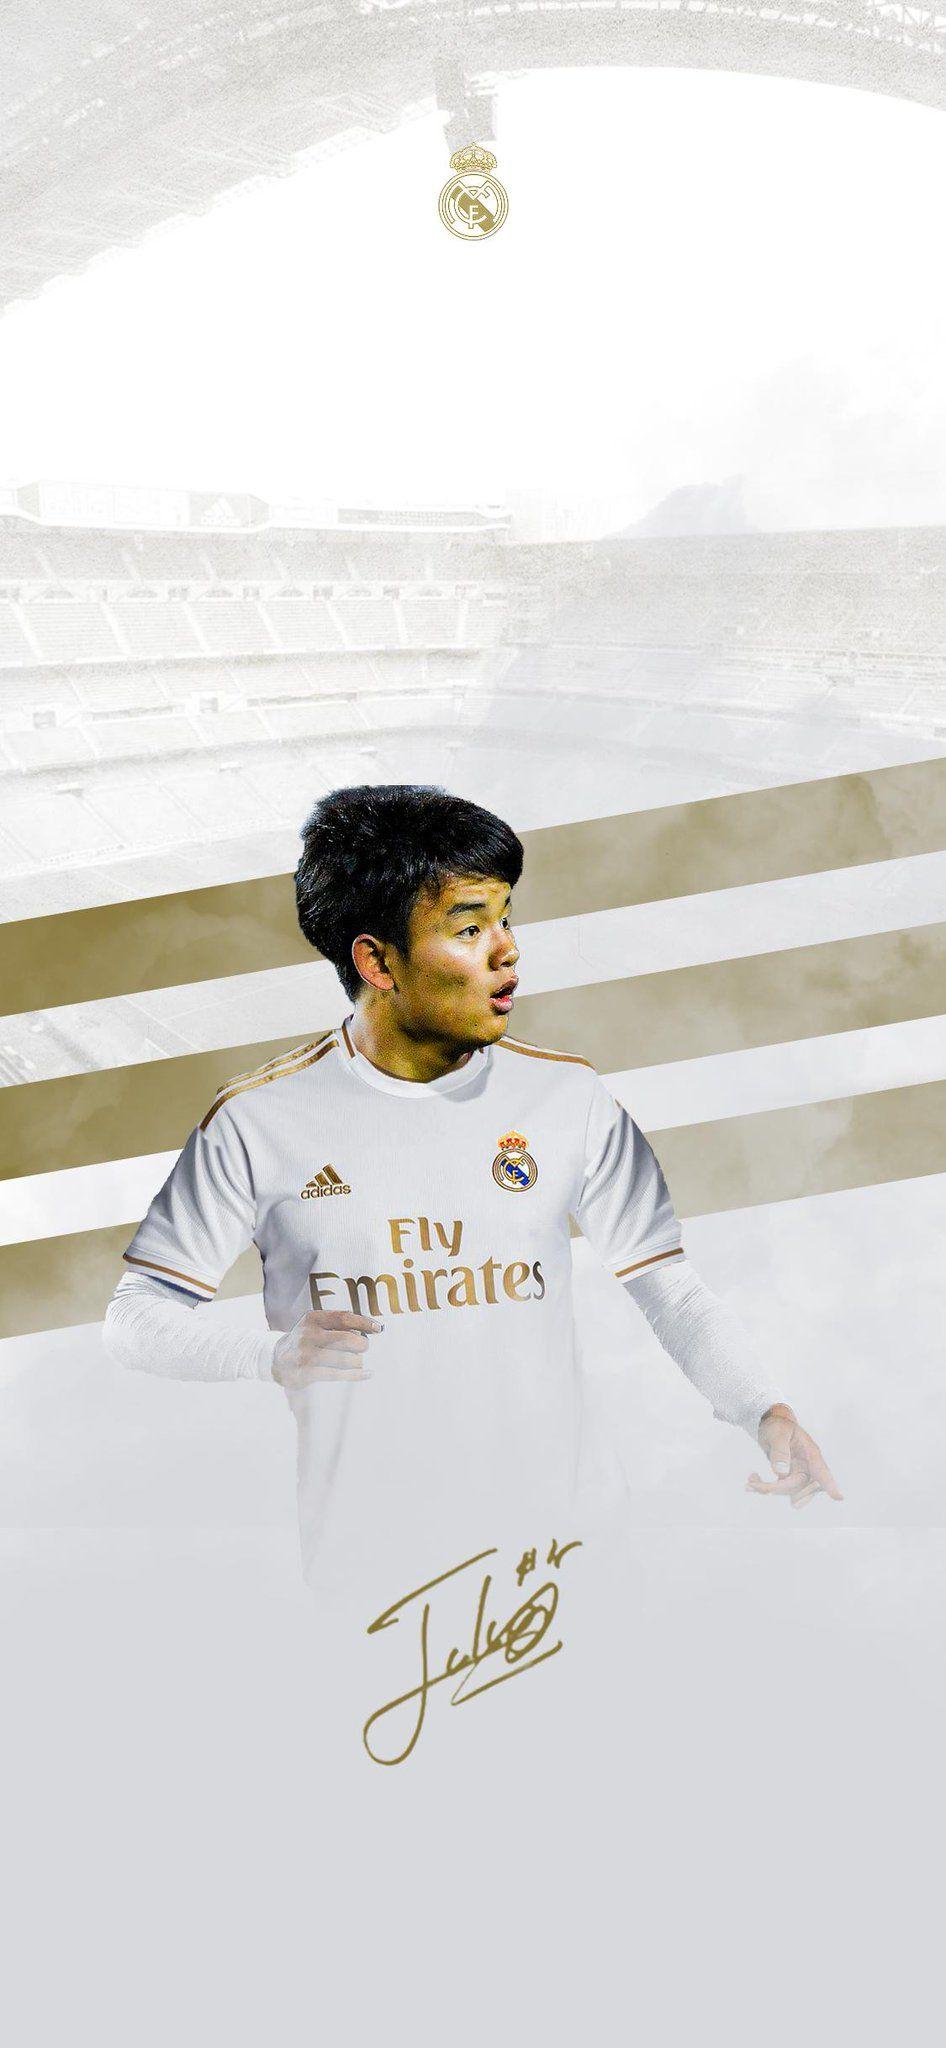 Dynanのメモブログ On サッカー 久保 サッカー選手 壁紙 サッカー